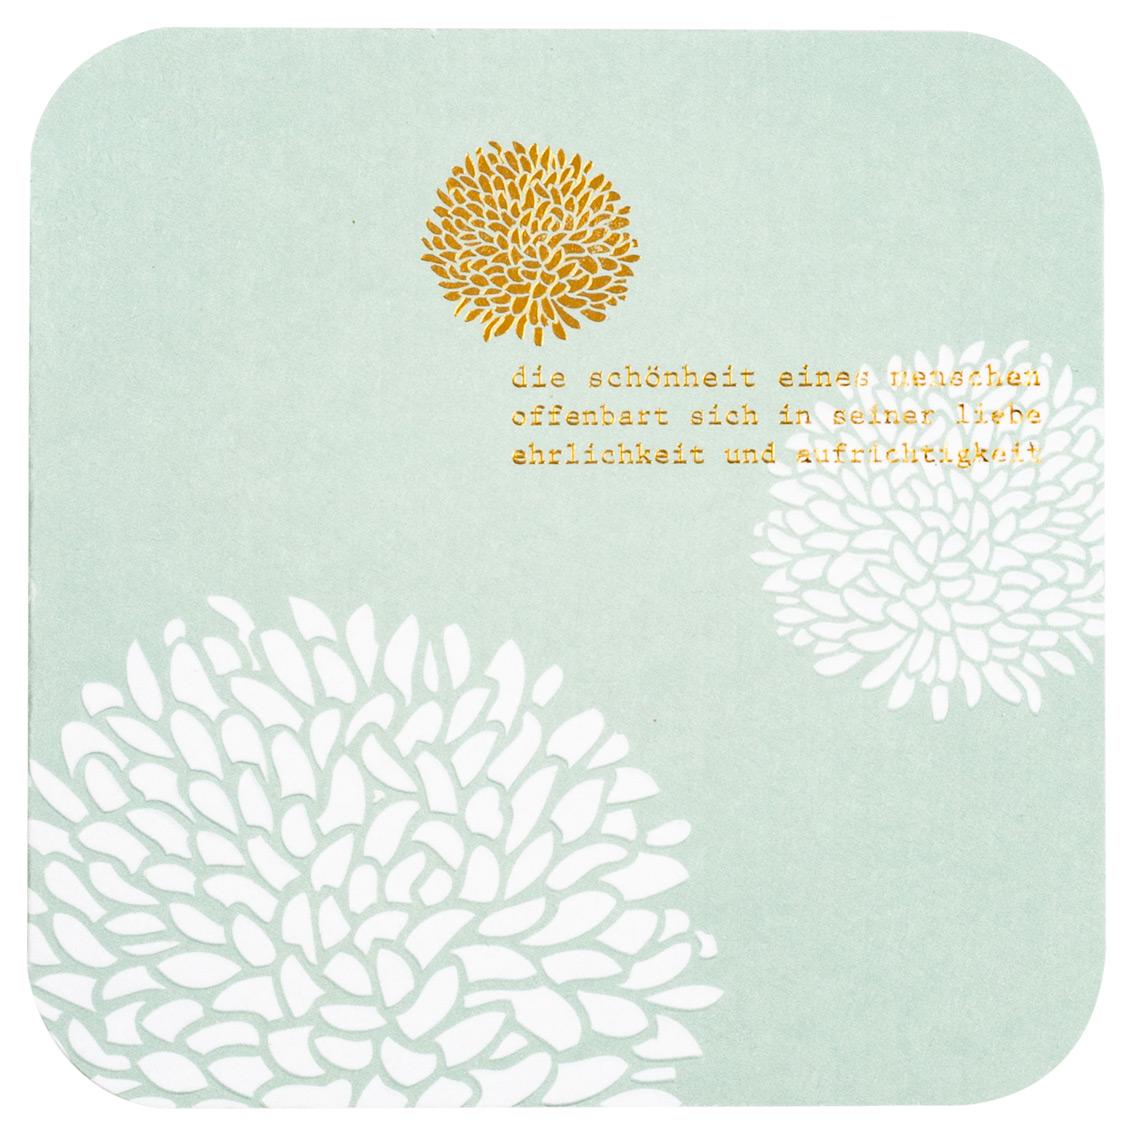 Blütenpoesiekarte